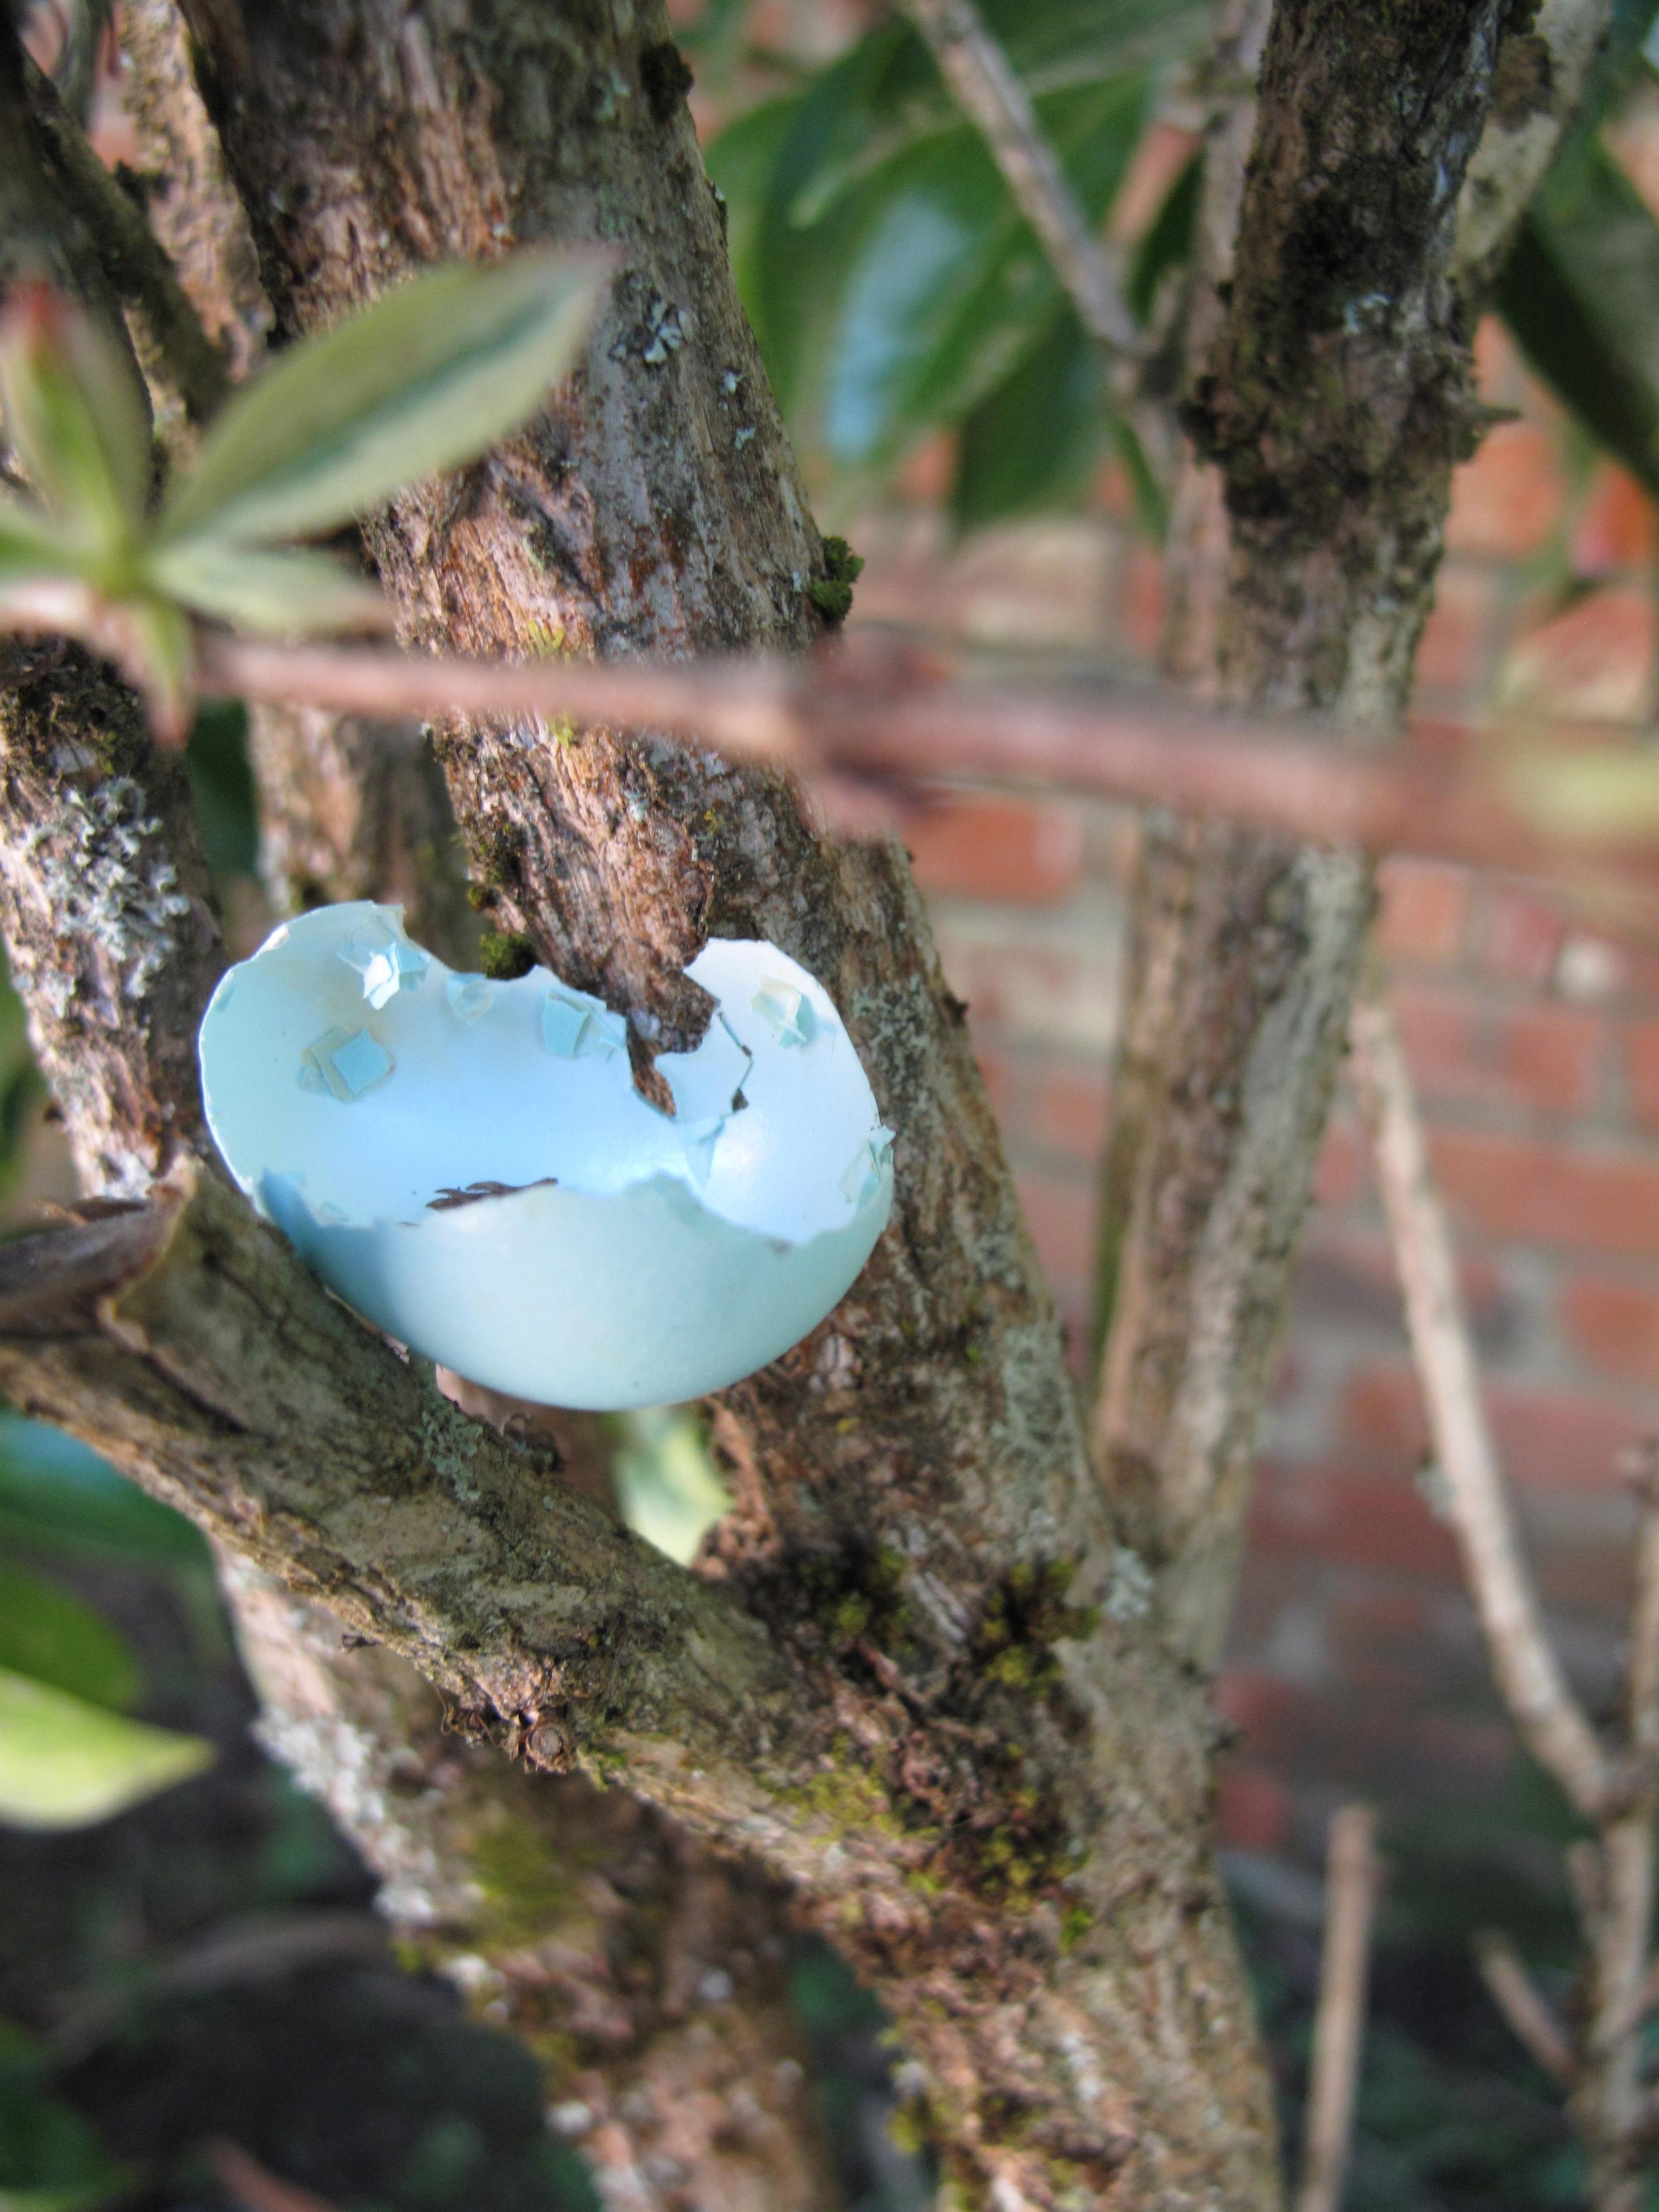 blue bird's egg in tree